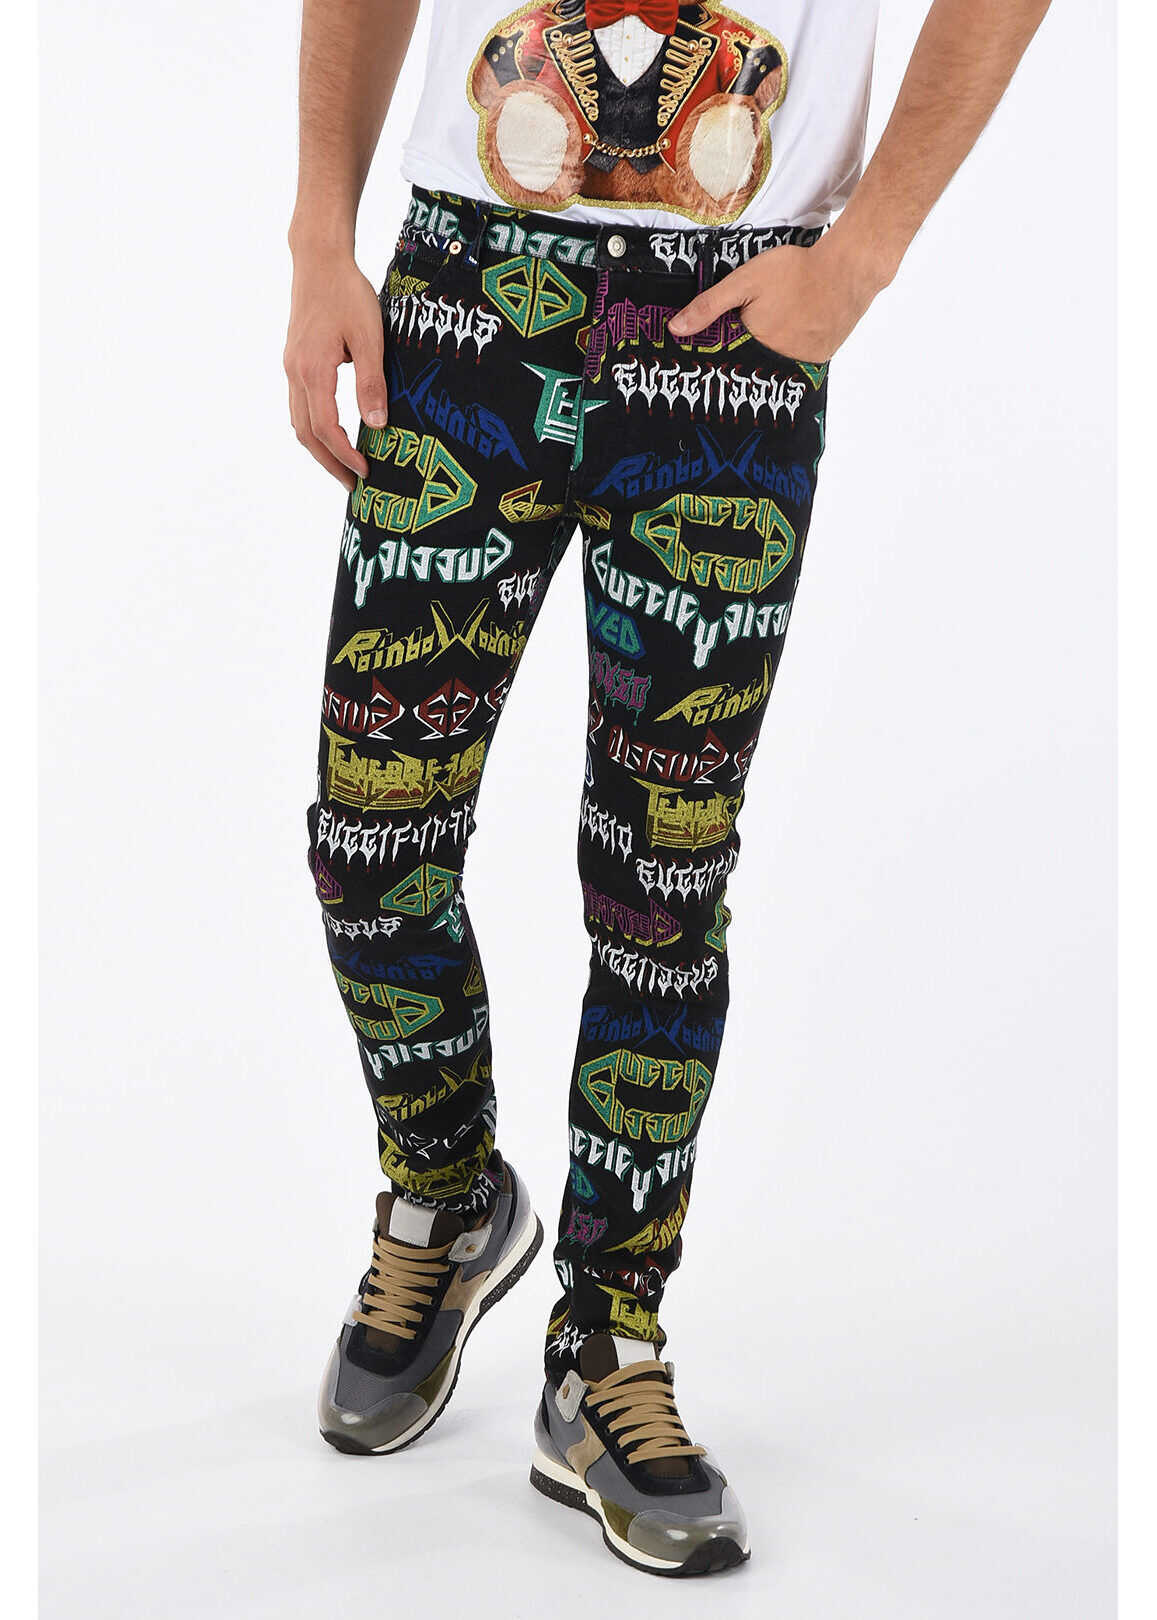 Gucci Slim Fit METAL Printed Jeans 15cm BLACK